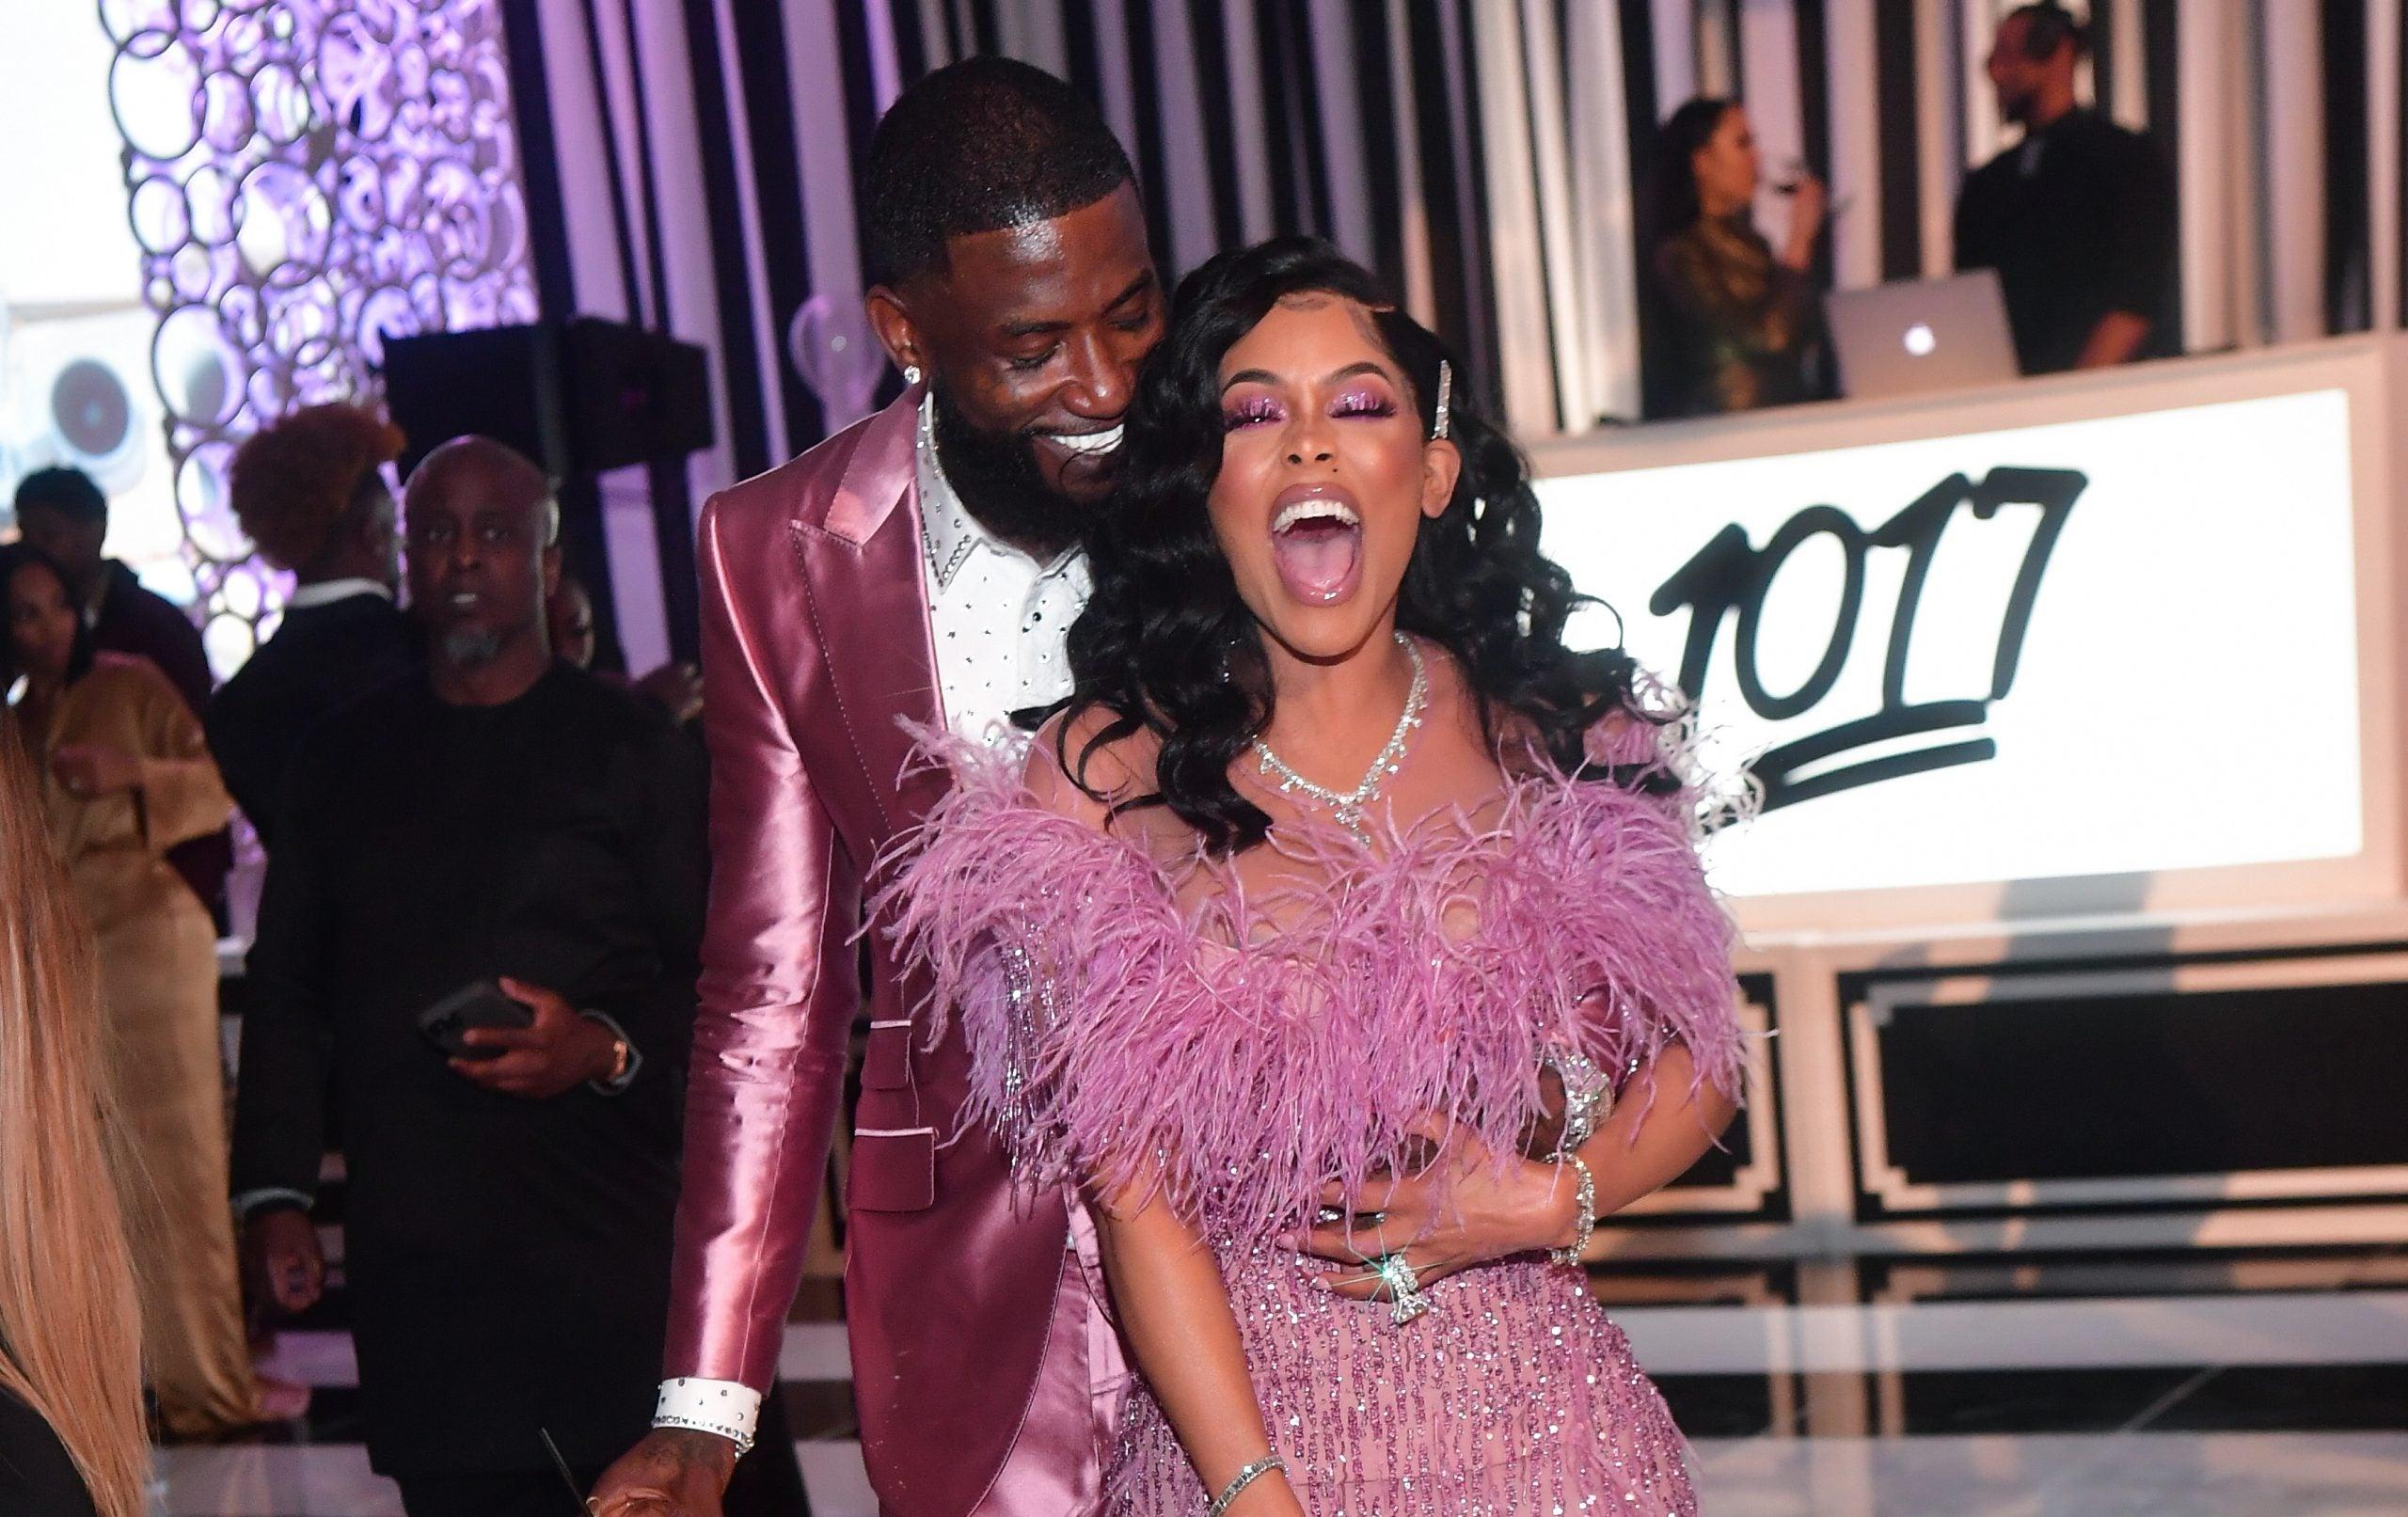 Gucci Mane And Keyshia Ka'oir Are Having A Baby!